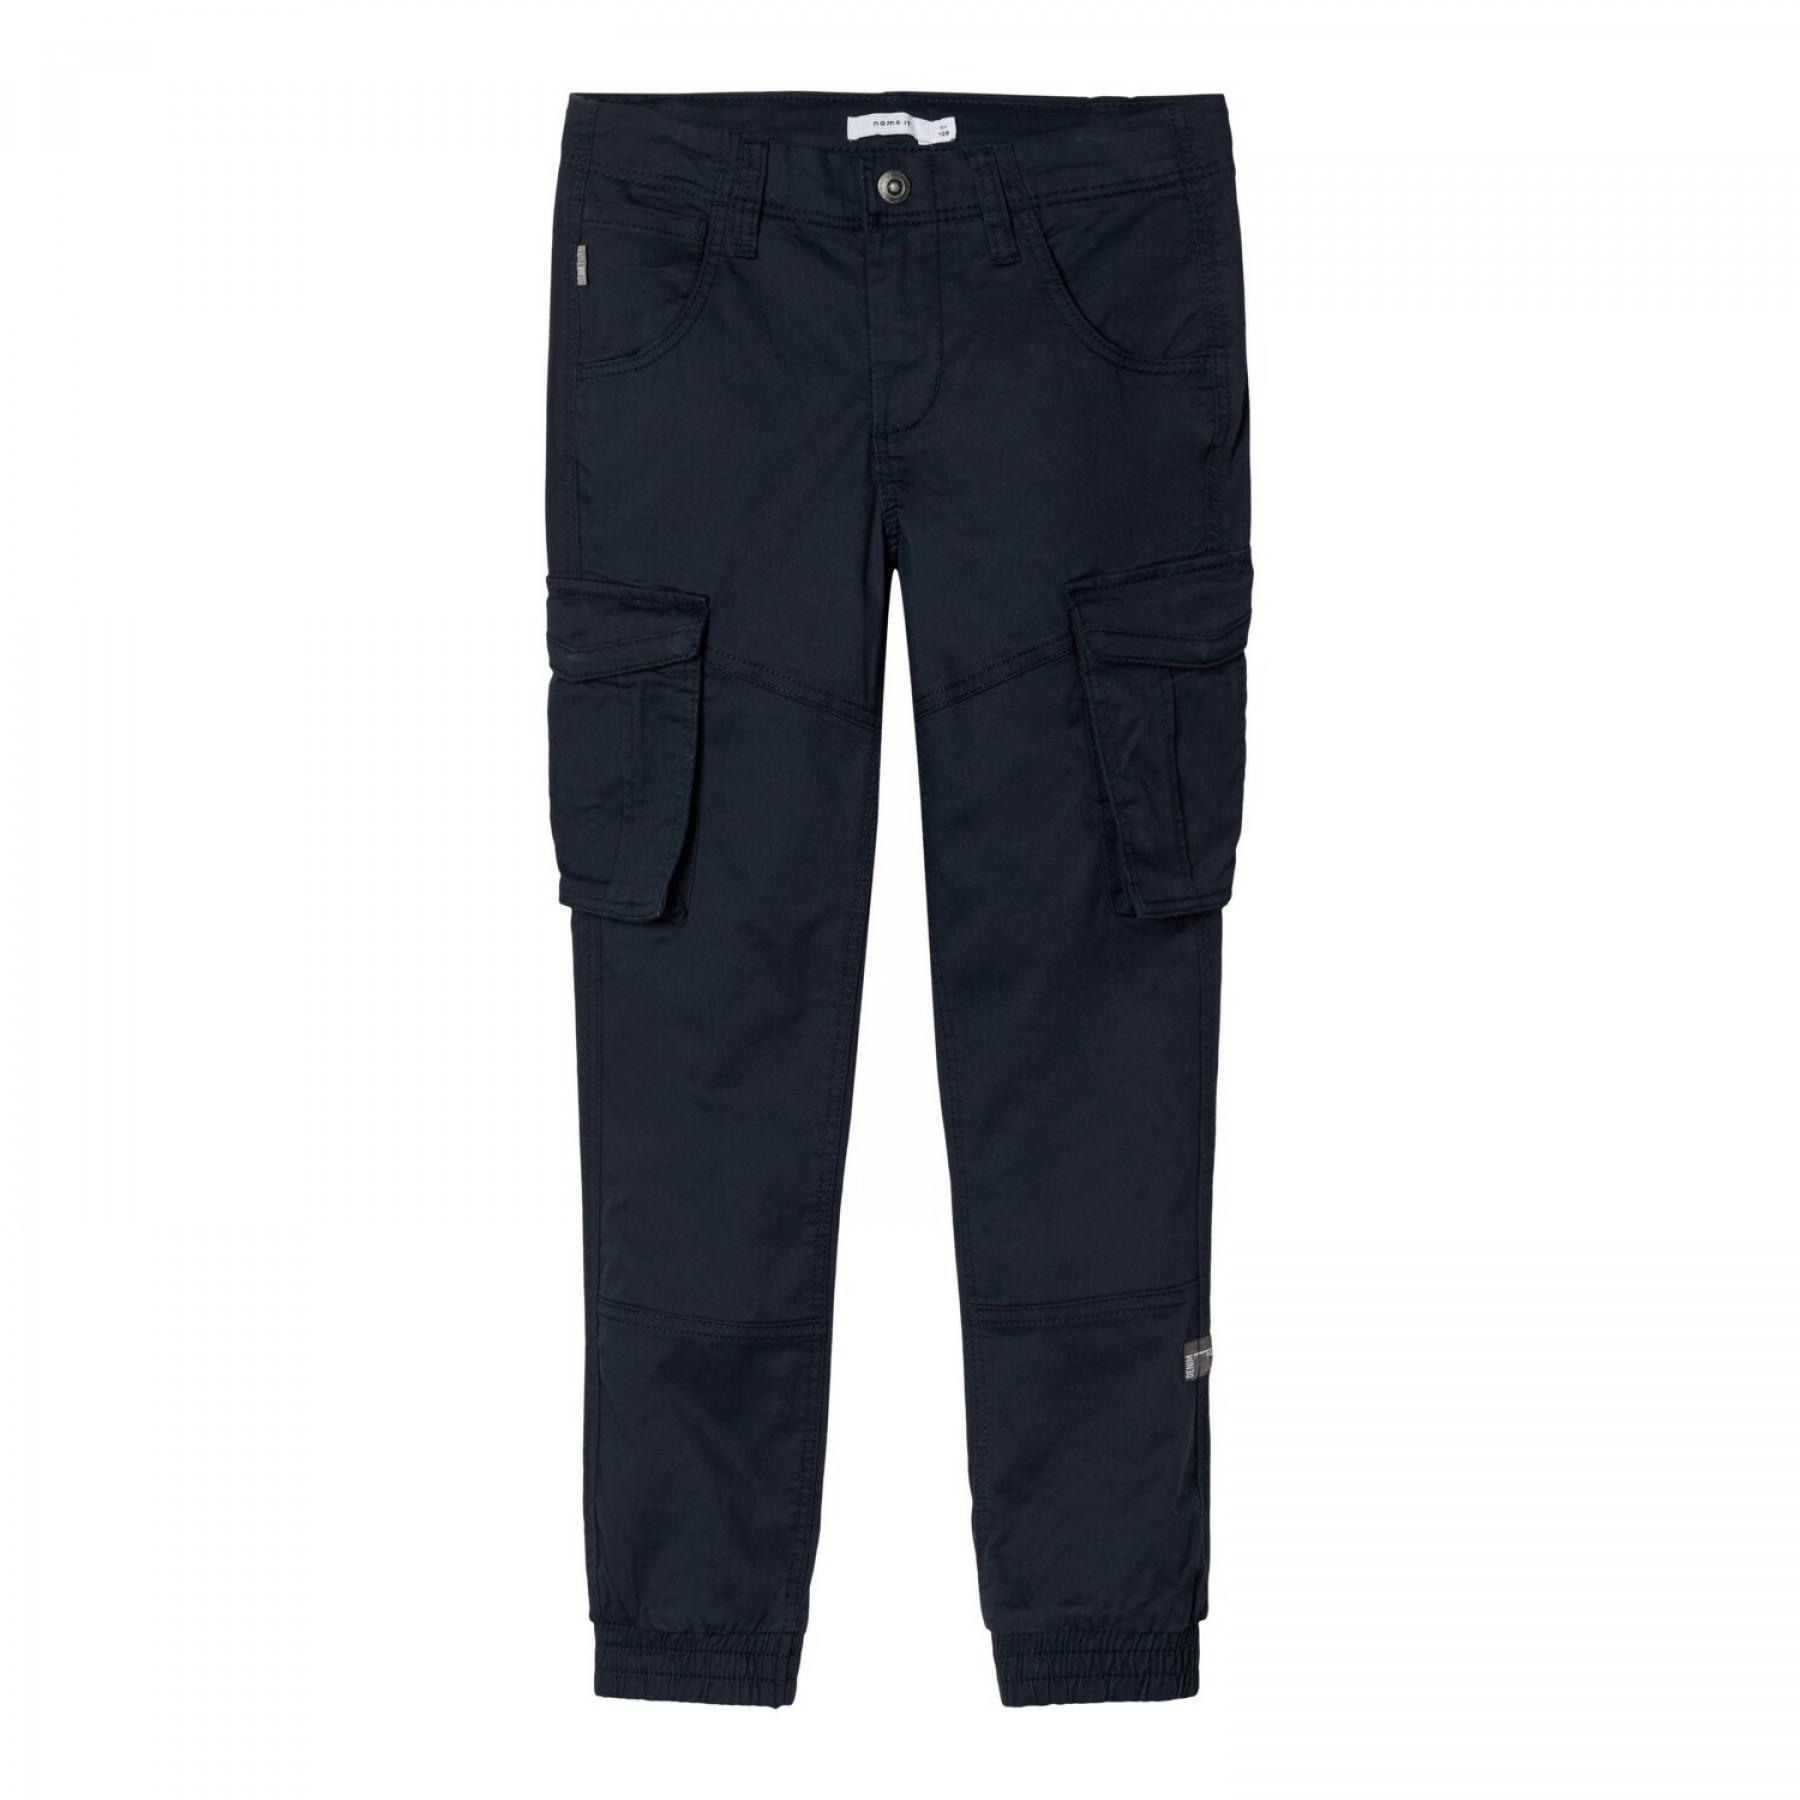 Pantalones cargo de niño Name it nitbamgo